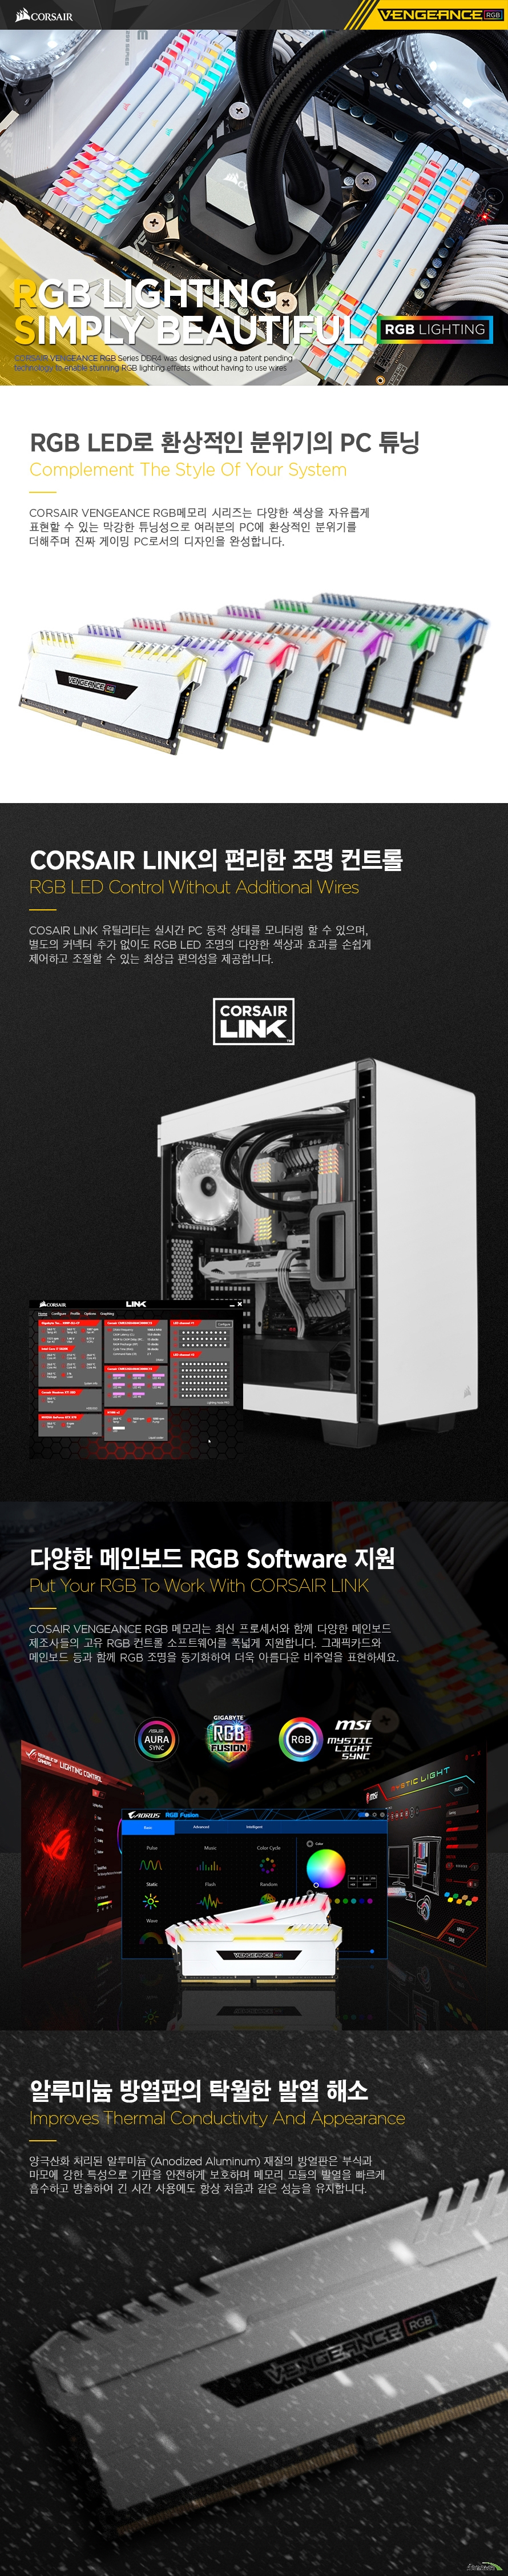 CORSAIR VENGEANCE RGB메모리 시리즈는 다양한 색상을 자유롭게 표현할 수 있는 막강한 튜닝성으로 여러분의 PC에 환상적인 분위기를 더해주며 진짜 게이밍 PC로서의 디자인을 완성합니다. COSAIR LINK 유틸리티는 실시간 PC 동작 상태를 모니터링 할 수 있으며, 별도의 커넥터 추가 없이도 RGB LED 조명의 다양한 색상과 효과를 손쉽게 제어하고 조절할 수 있는 최상급 편의성을 제공합니다. 양극산화 처리된 알루미늄 (Anodized Aluminum) 재질의 방열판은 부식과 마모에 강한 특성으로 기판을 안전하게 보호하며 메모리 모듈의 발열을 빠르게 흡수하고 방출하여 긴 시간 사용에도 항상 처음과 같은 성능을 유지합니다.